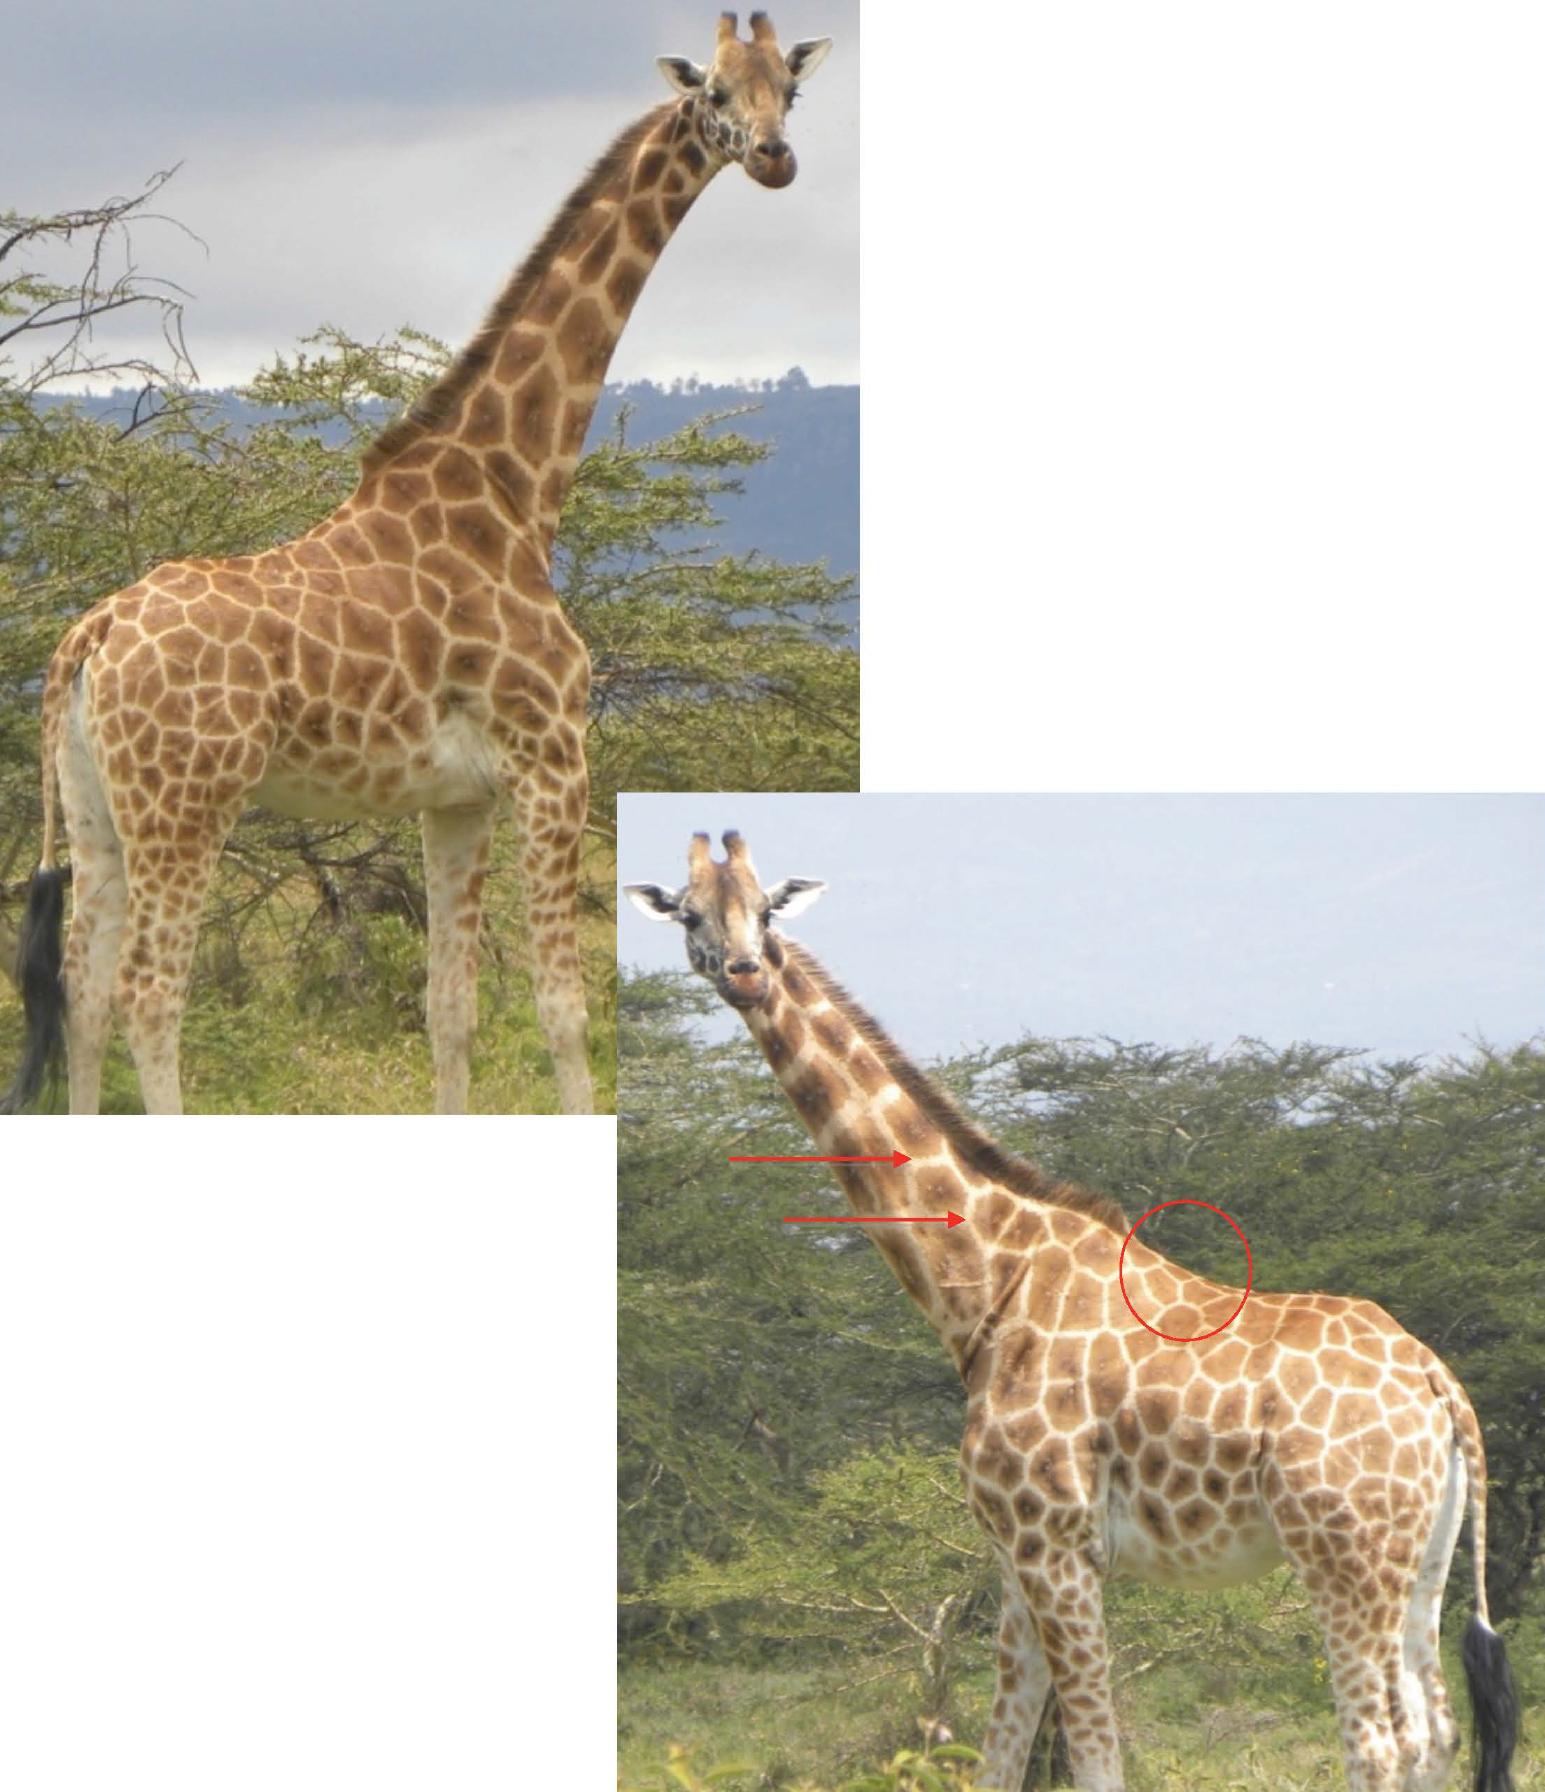 Giraffe identification